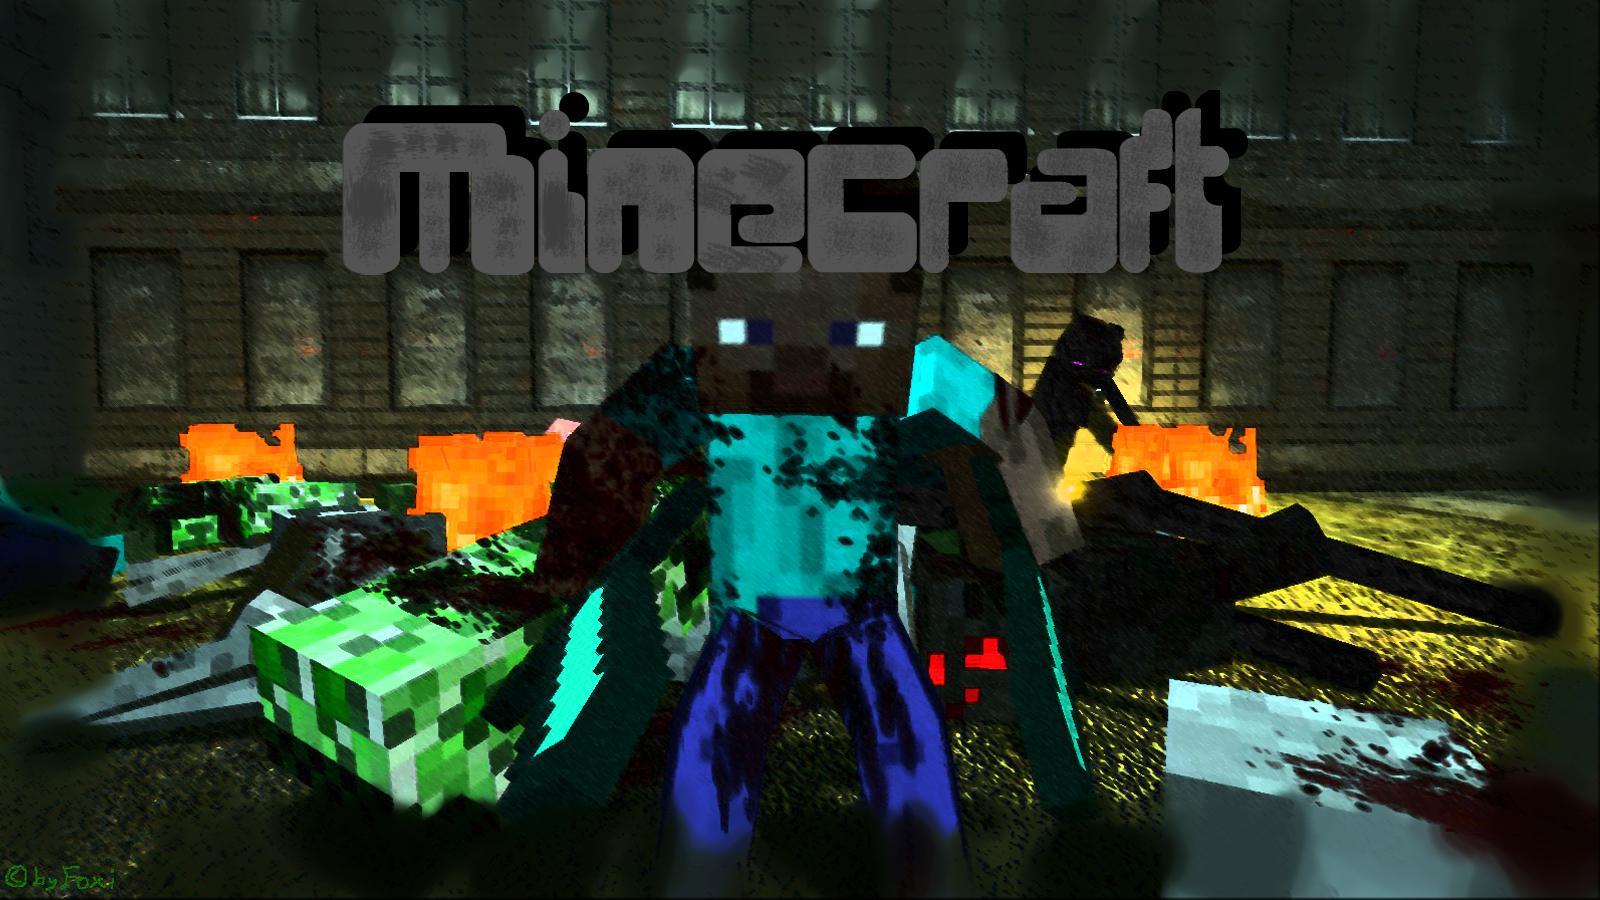 Top Wallpaper Minecraft Gamer - amazing-minecraft-backgrounds-18  Snapshot_463459.jpg